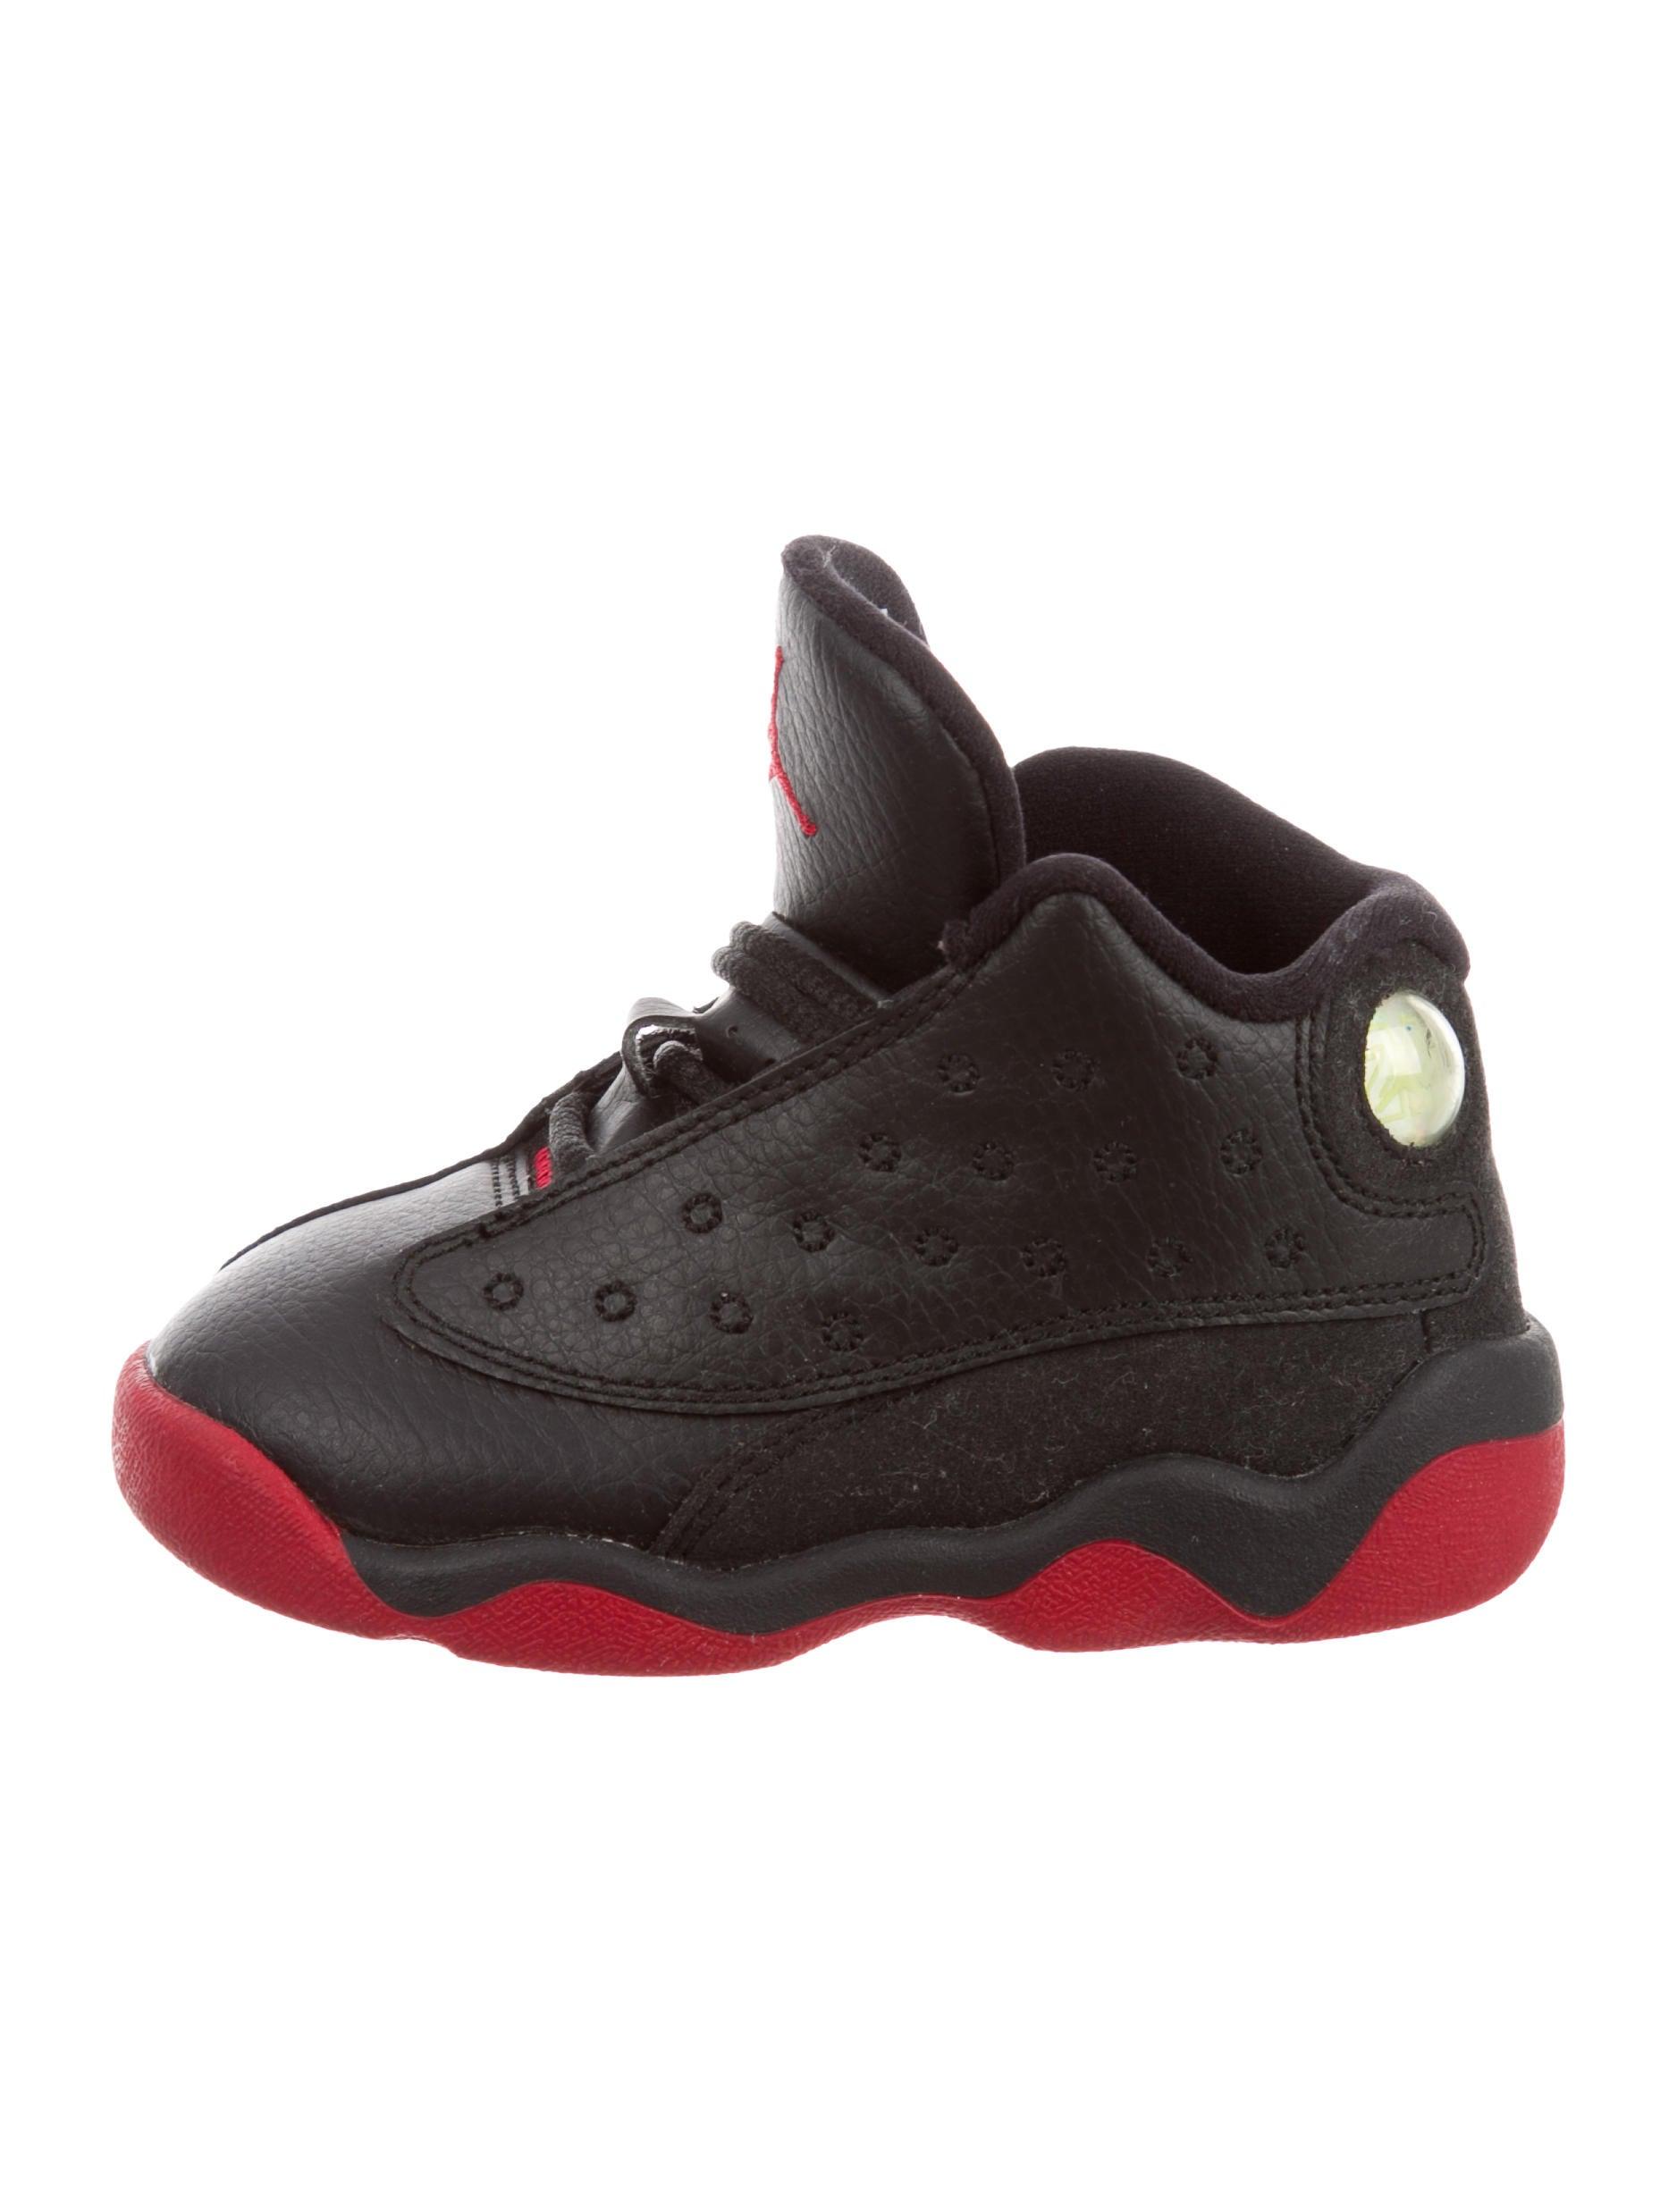 new arrival 5abb0 ff74e Nike Air Jordan Boys' 13 Retro Dirty Bred Sneakers